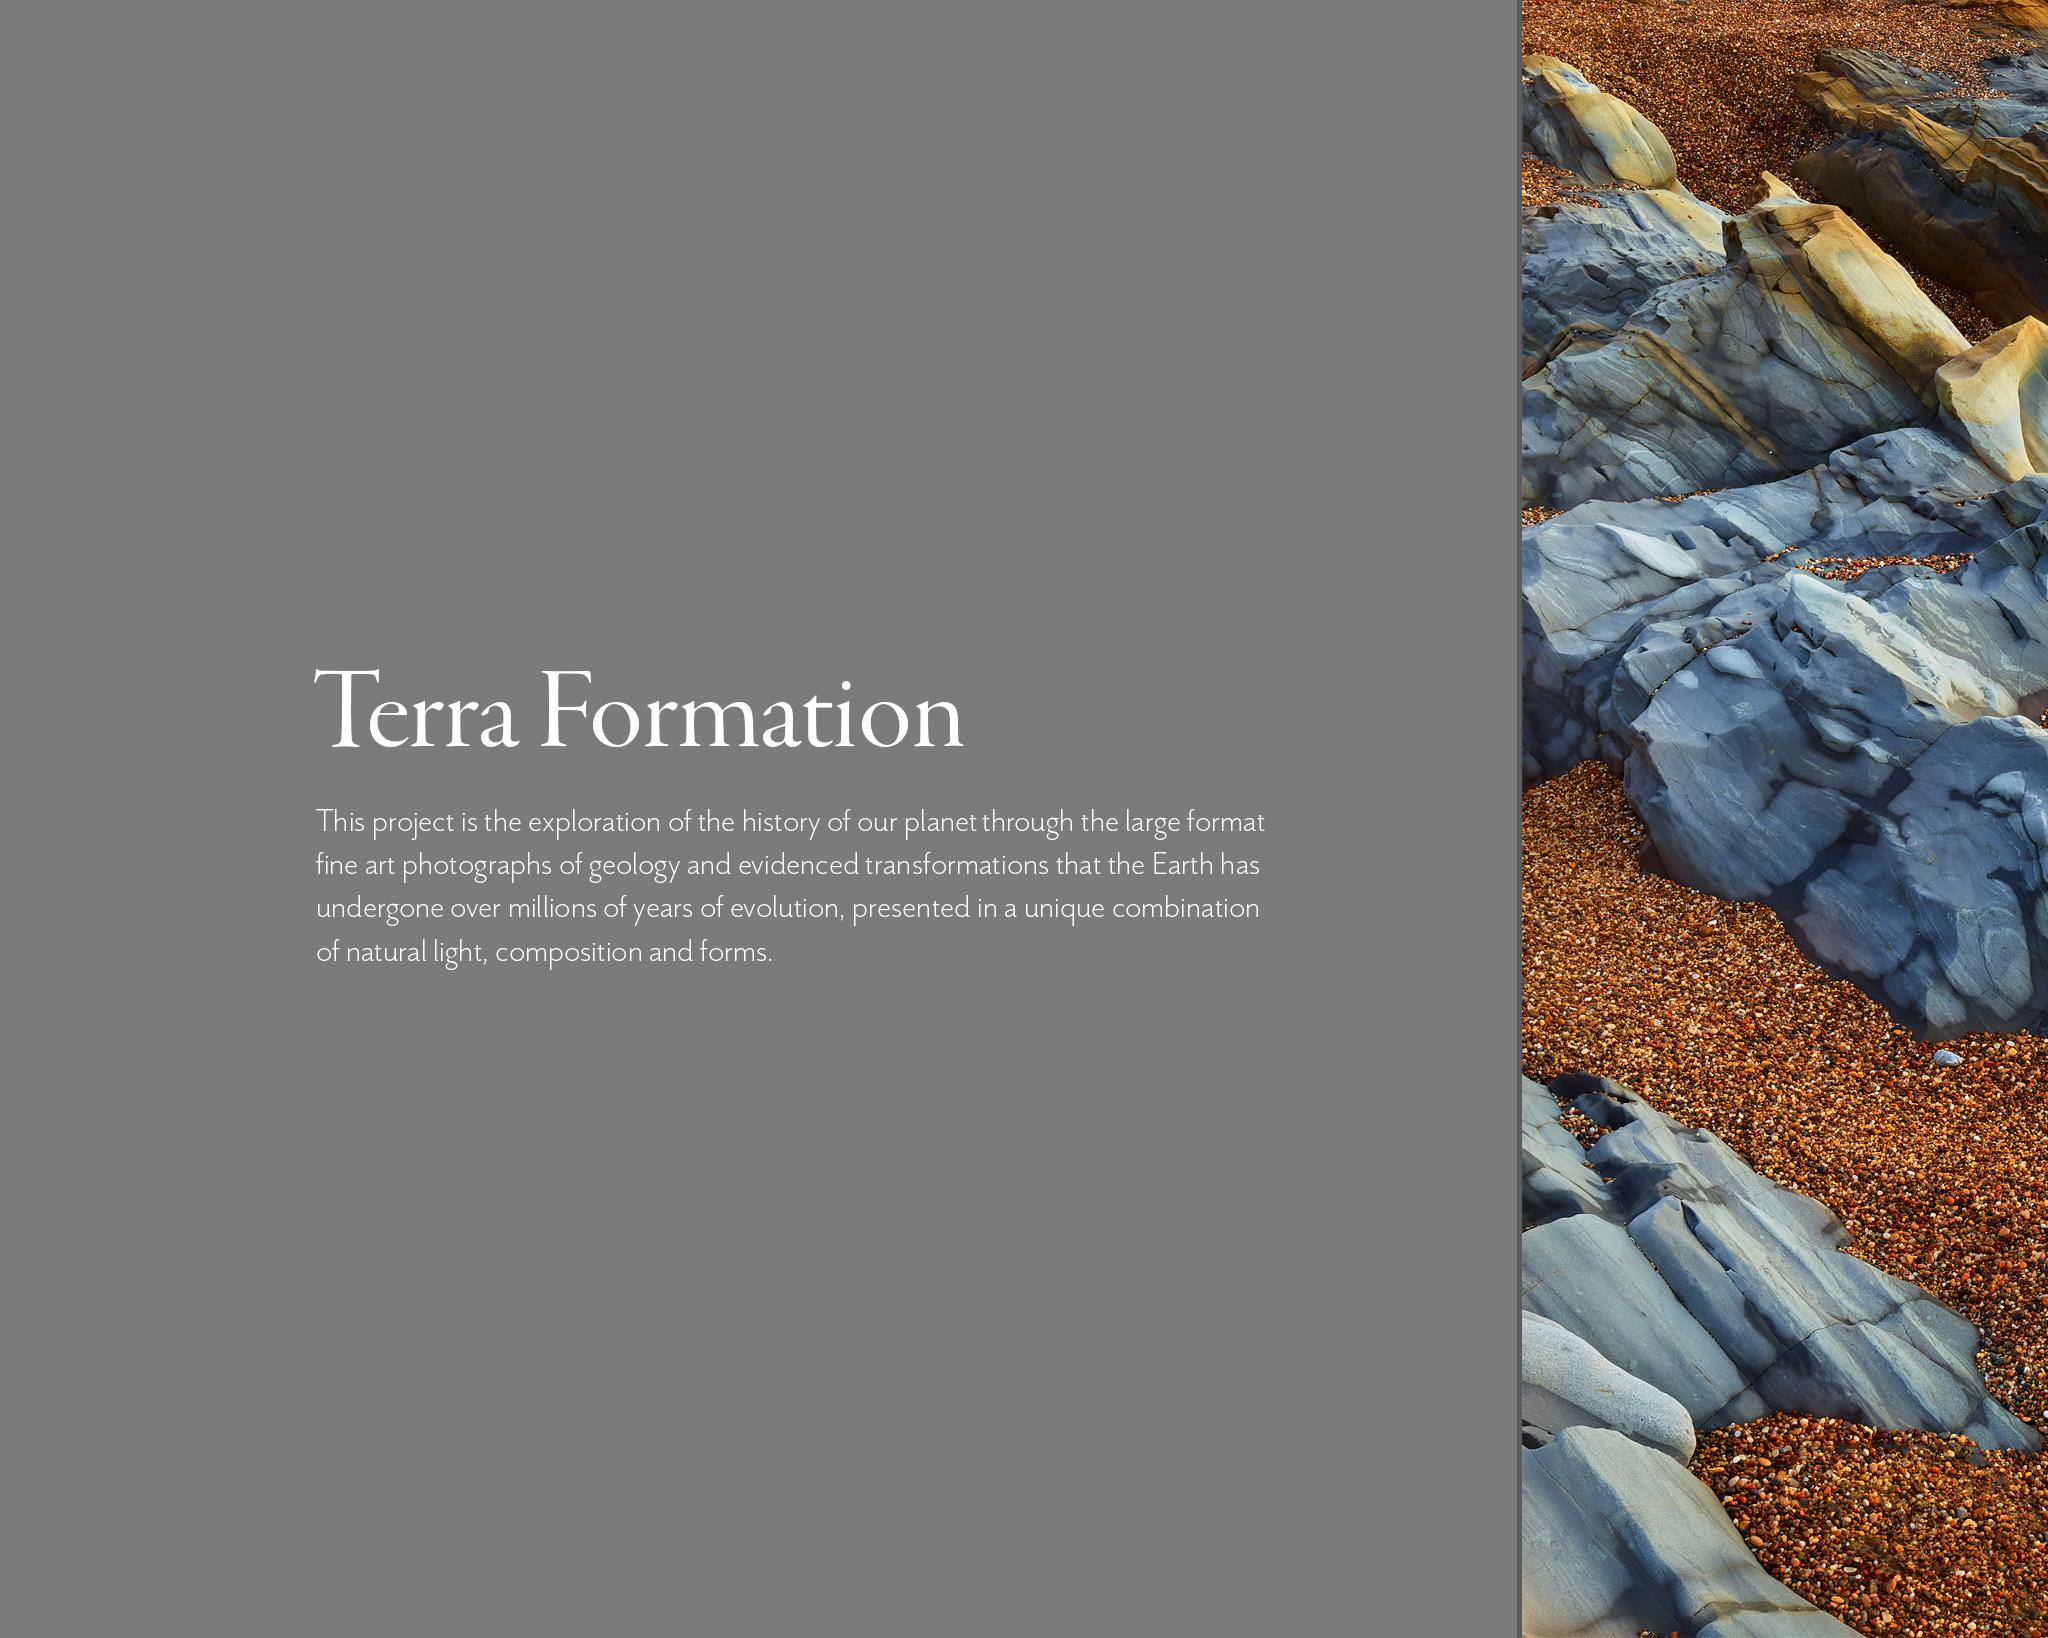 Terra Formation